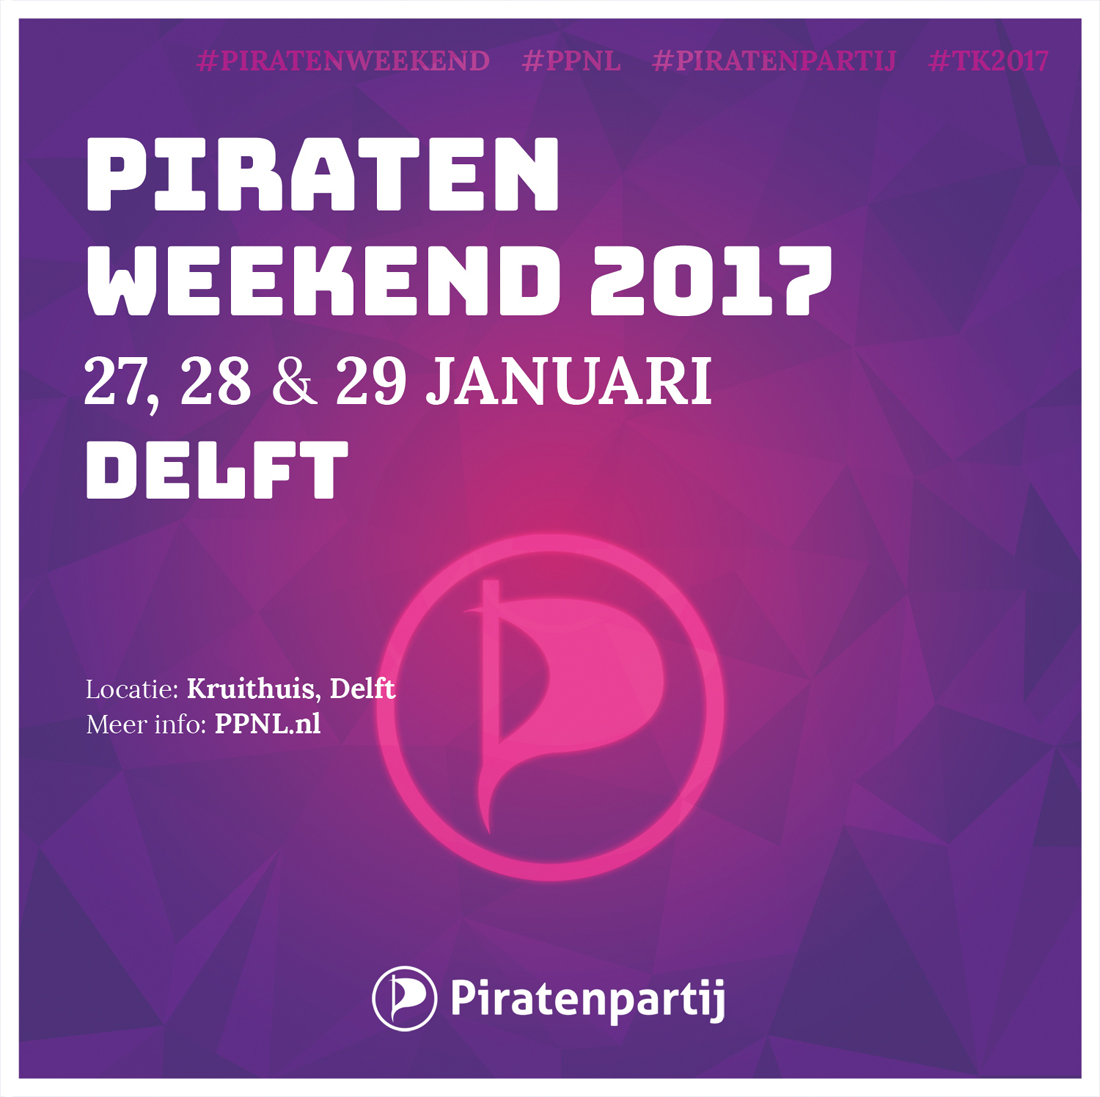 Piratenpartij Delft organiseert groot Piratenweekend